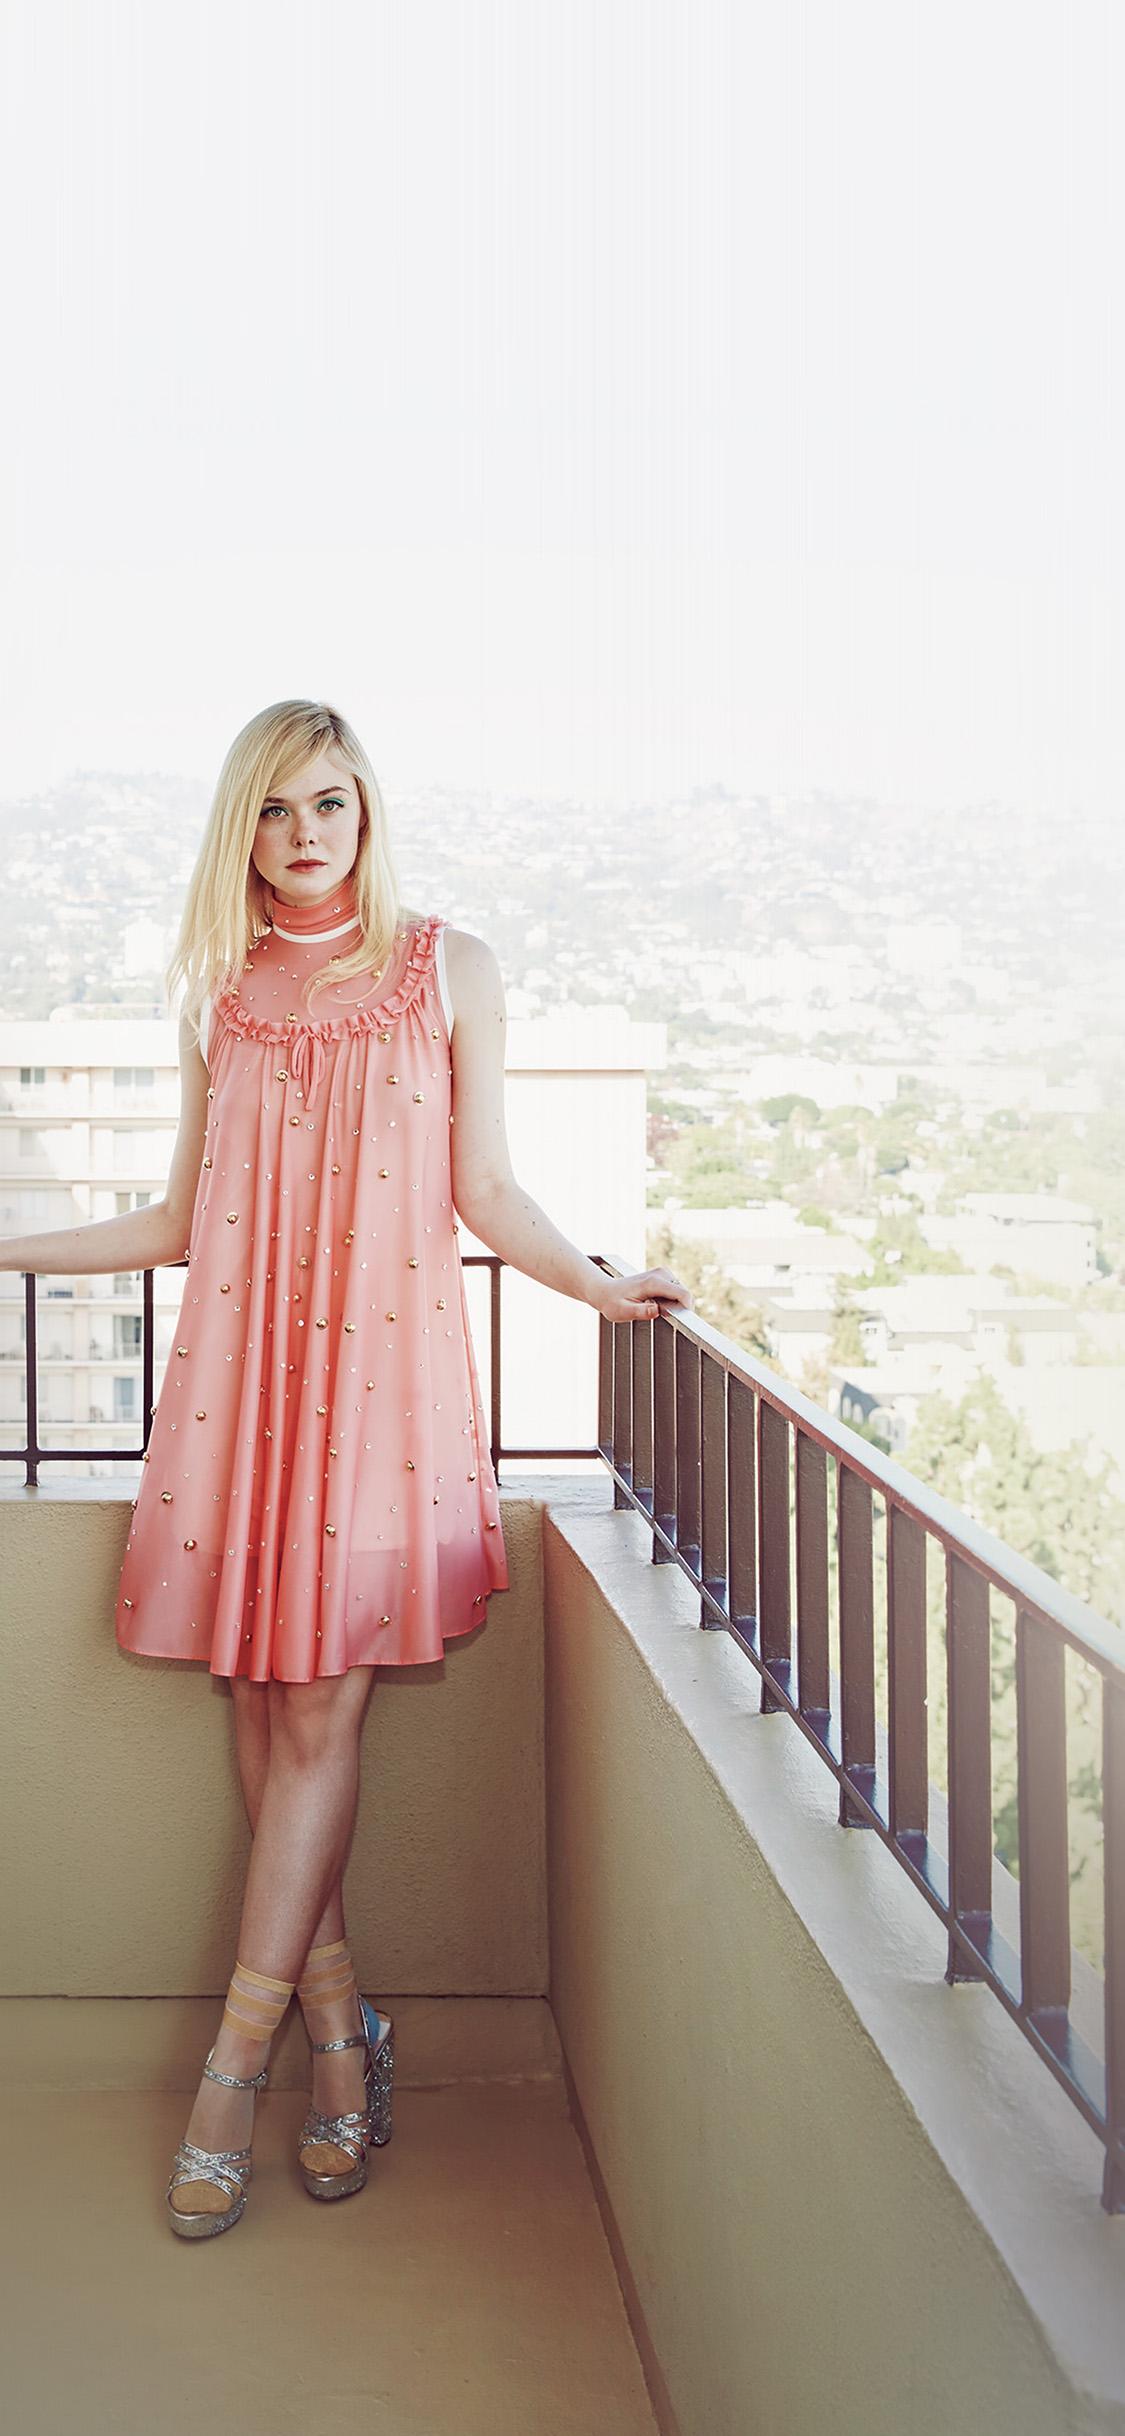 iPhonexpapers.com-Apple-iPhone-wallpaper-hs36-girl-celebrity-film-actress-summer